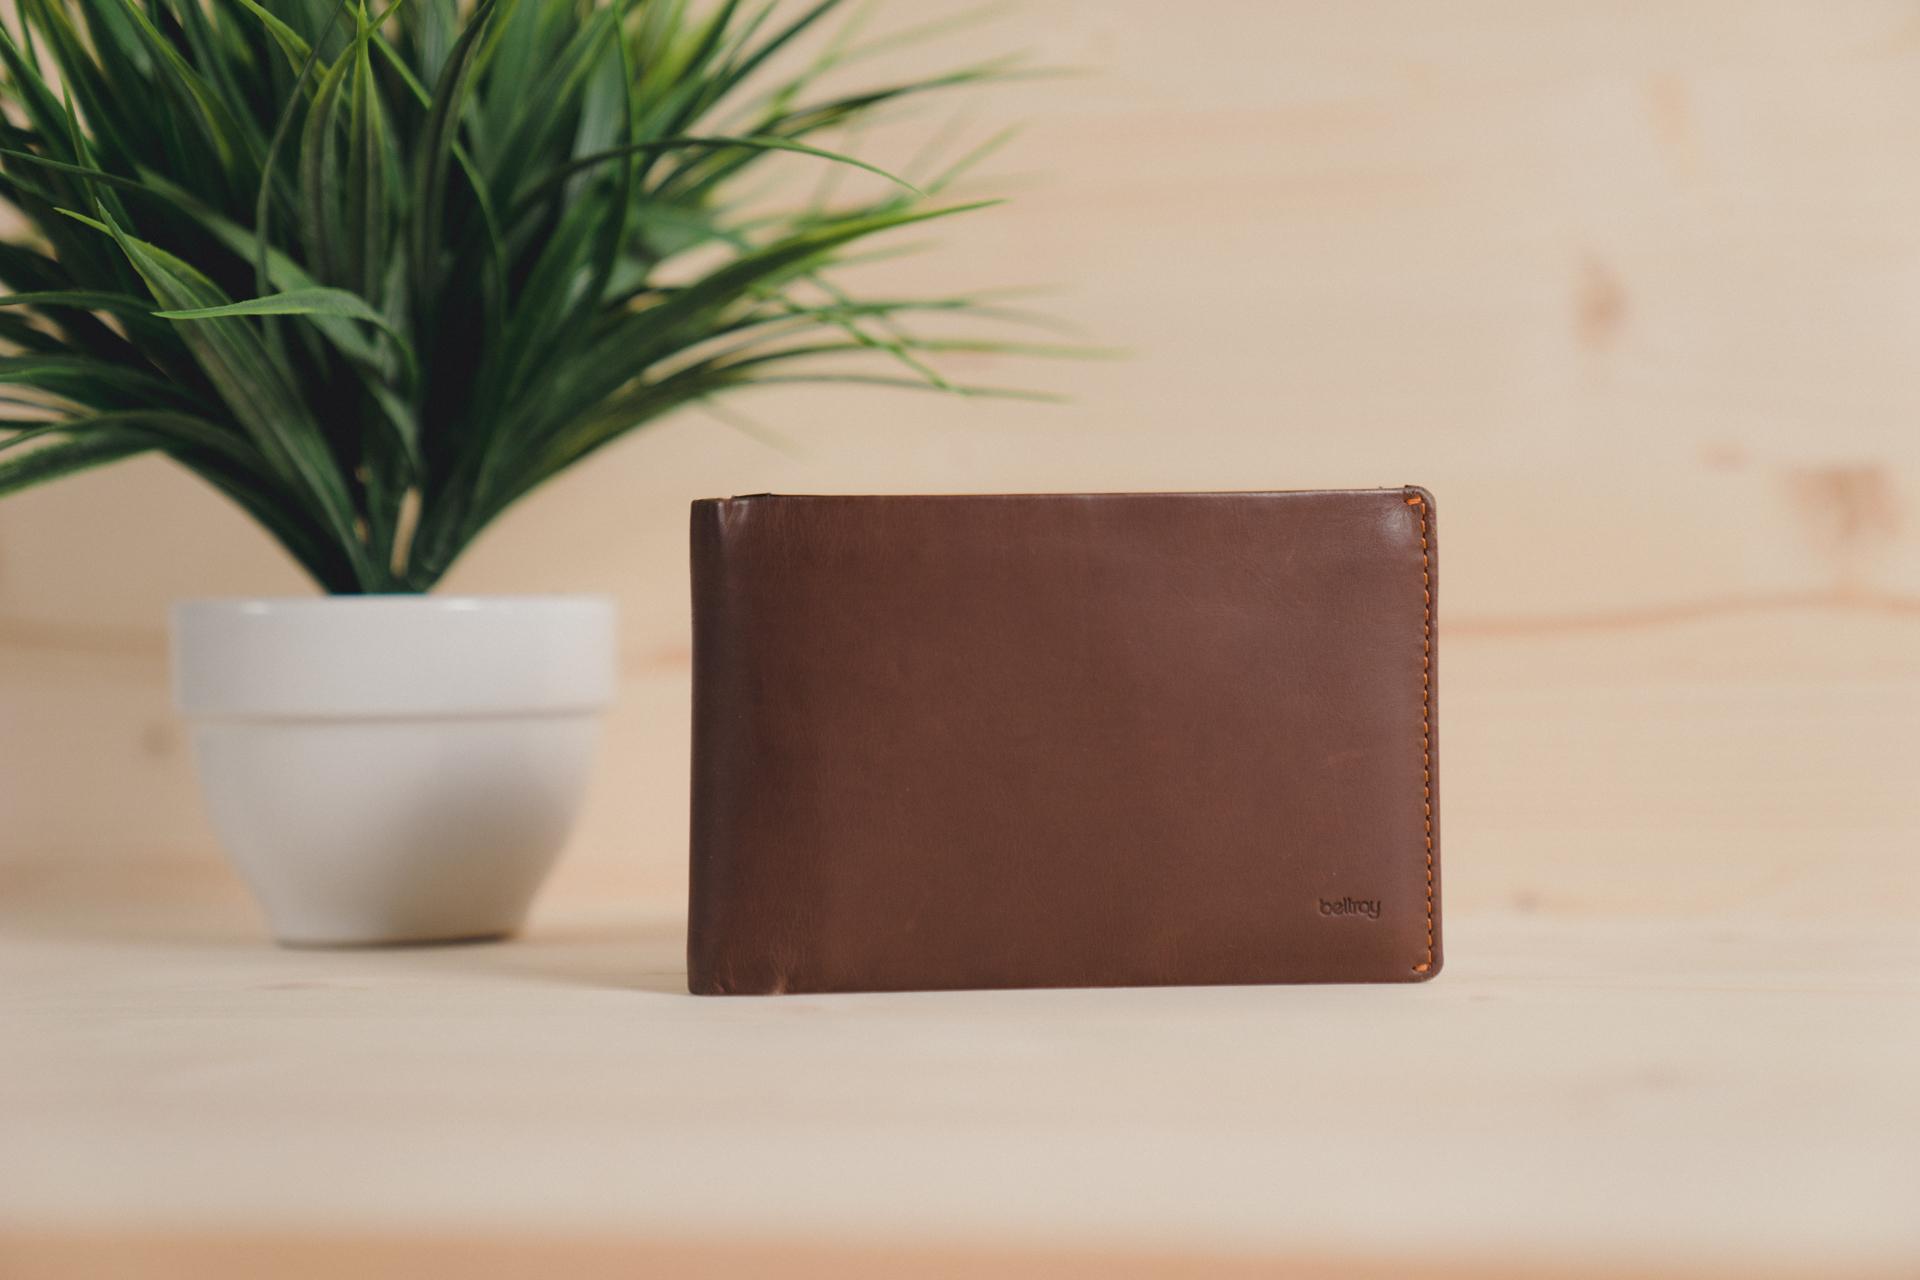 Bellroy-Travel-Wallet-2.jpg